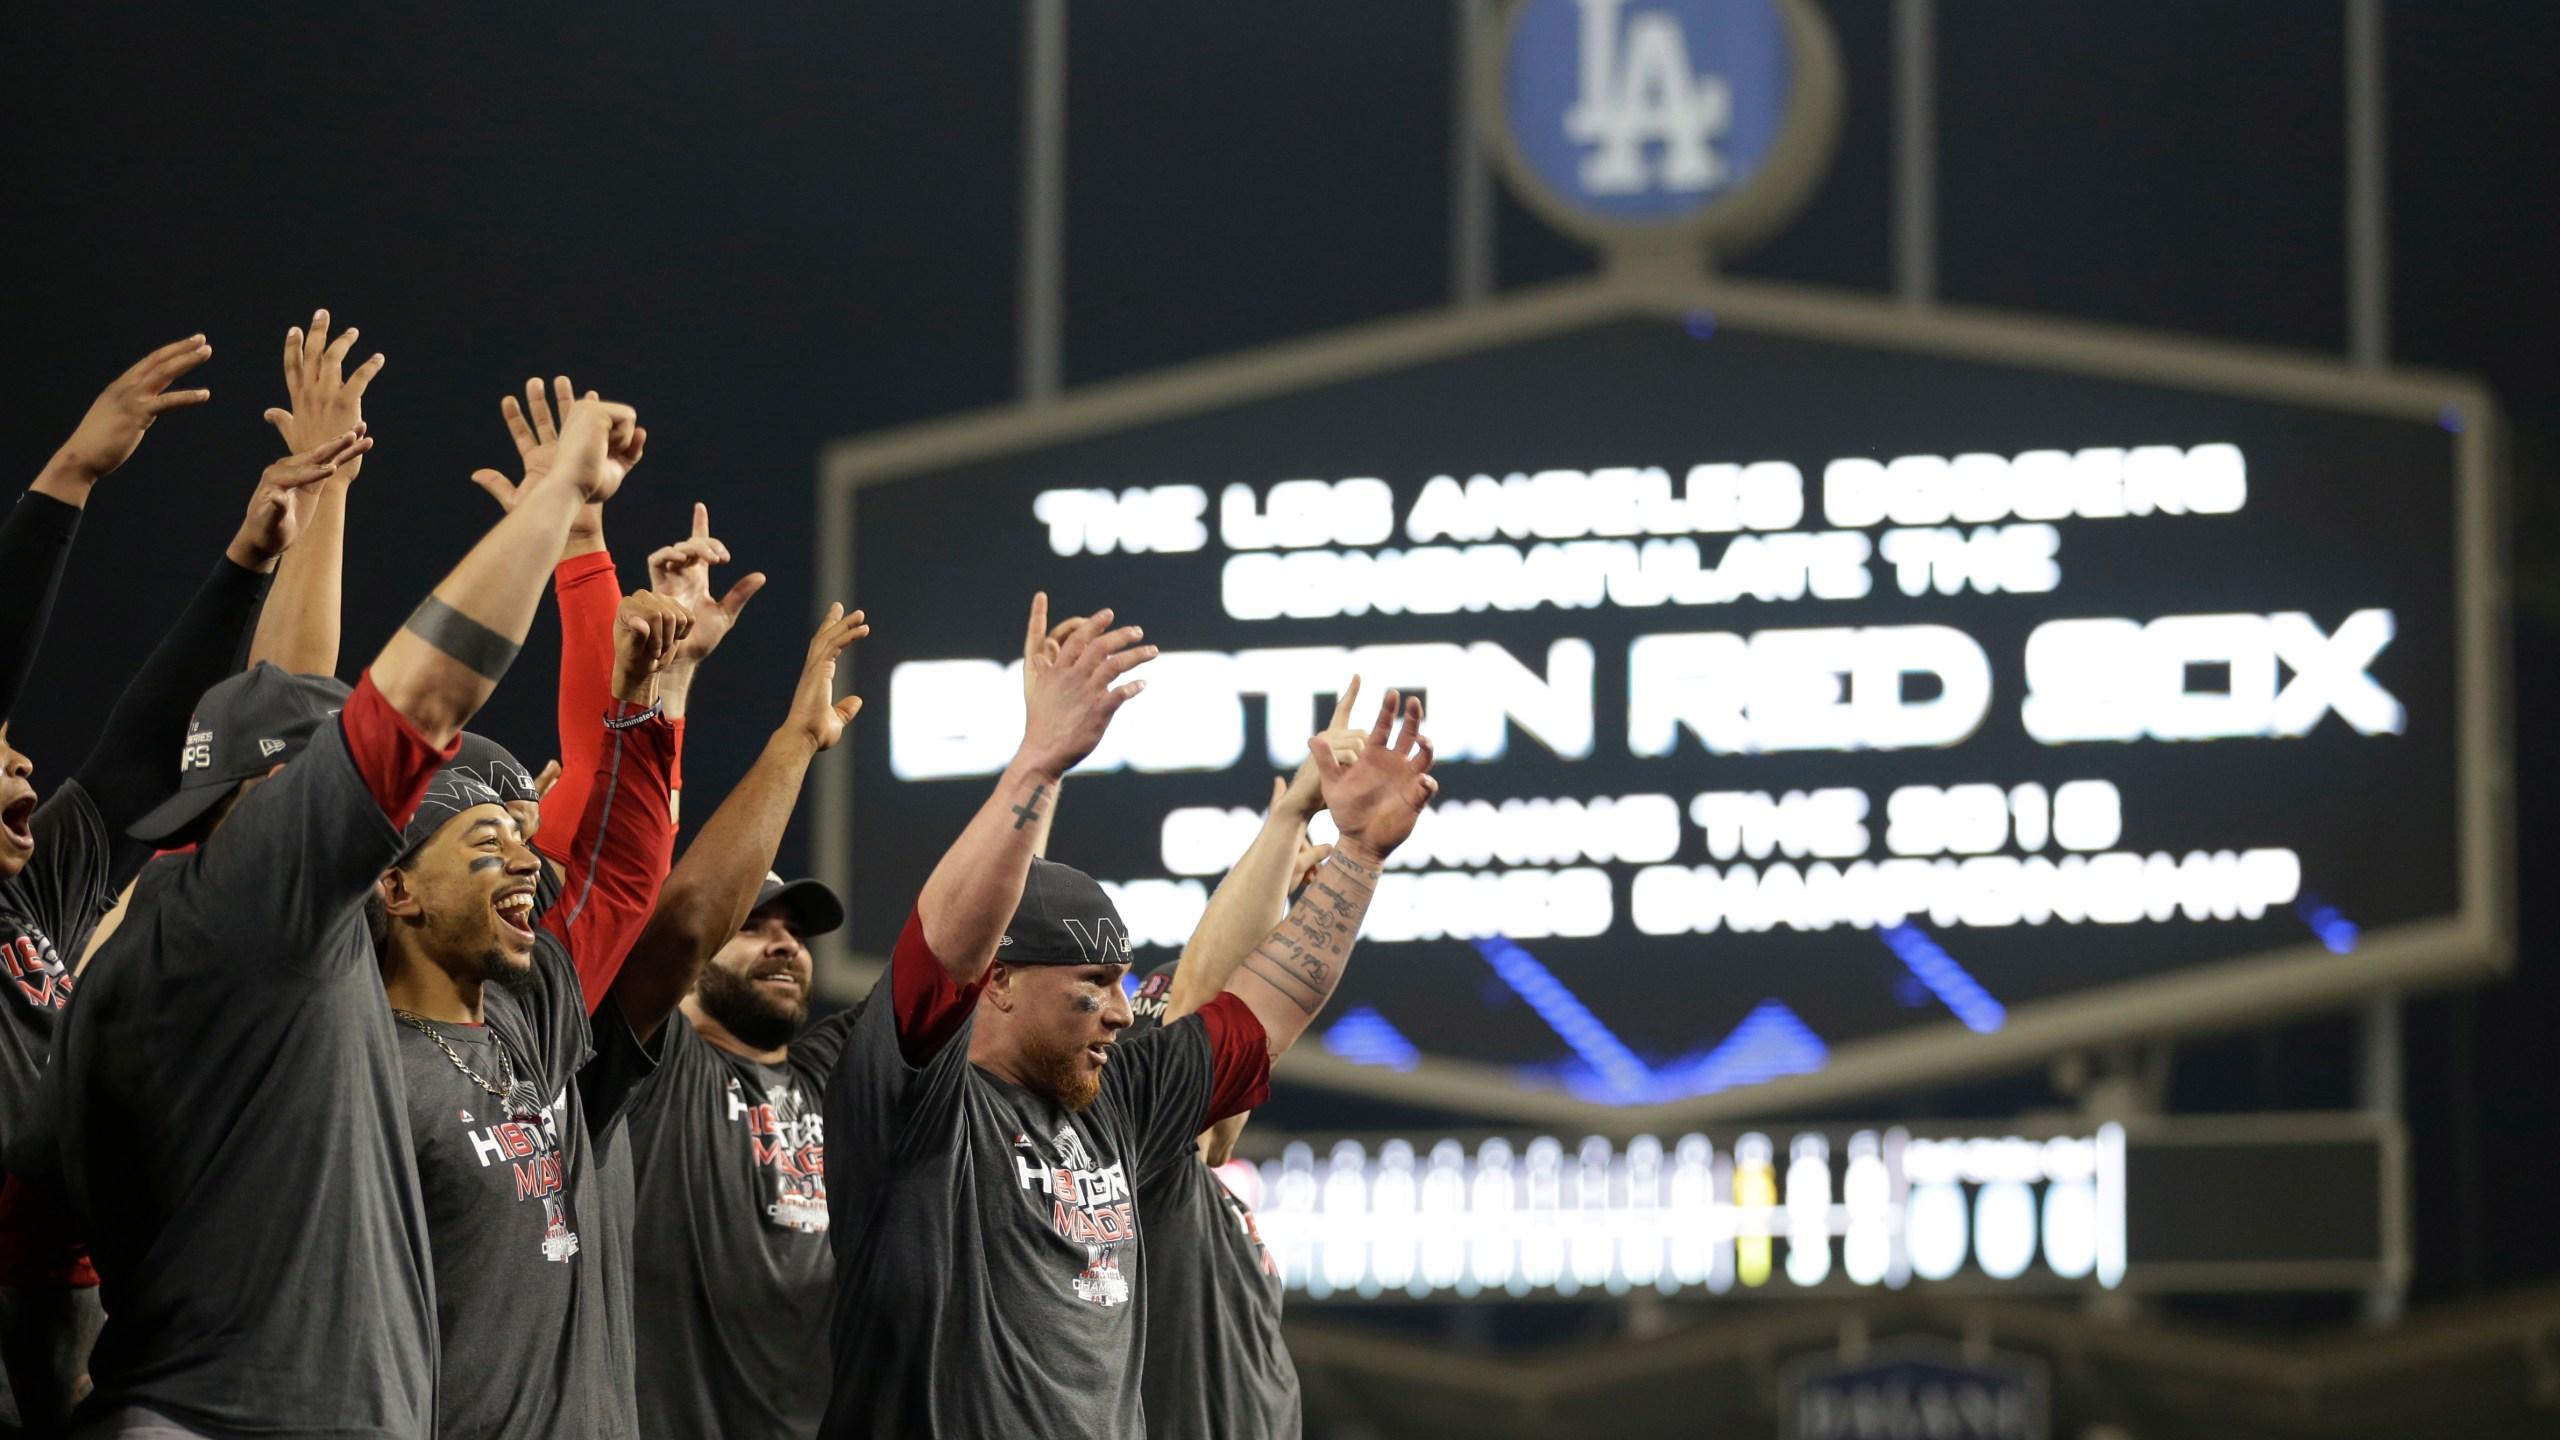 World_Series_Red_Sox_Dodgers_Baseball_68938-159532.jpg76130088